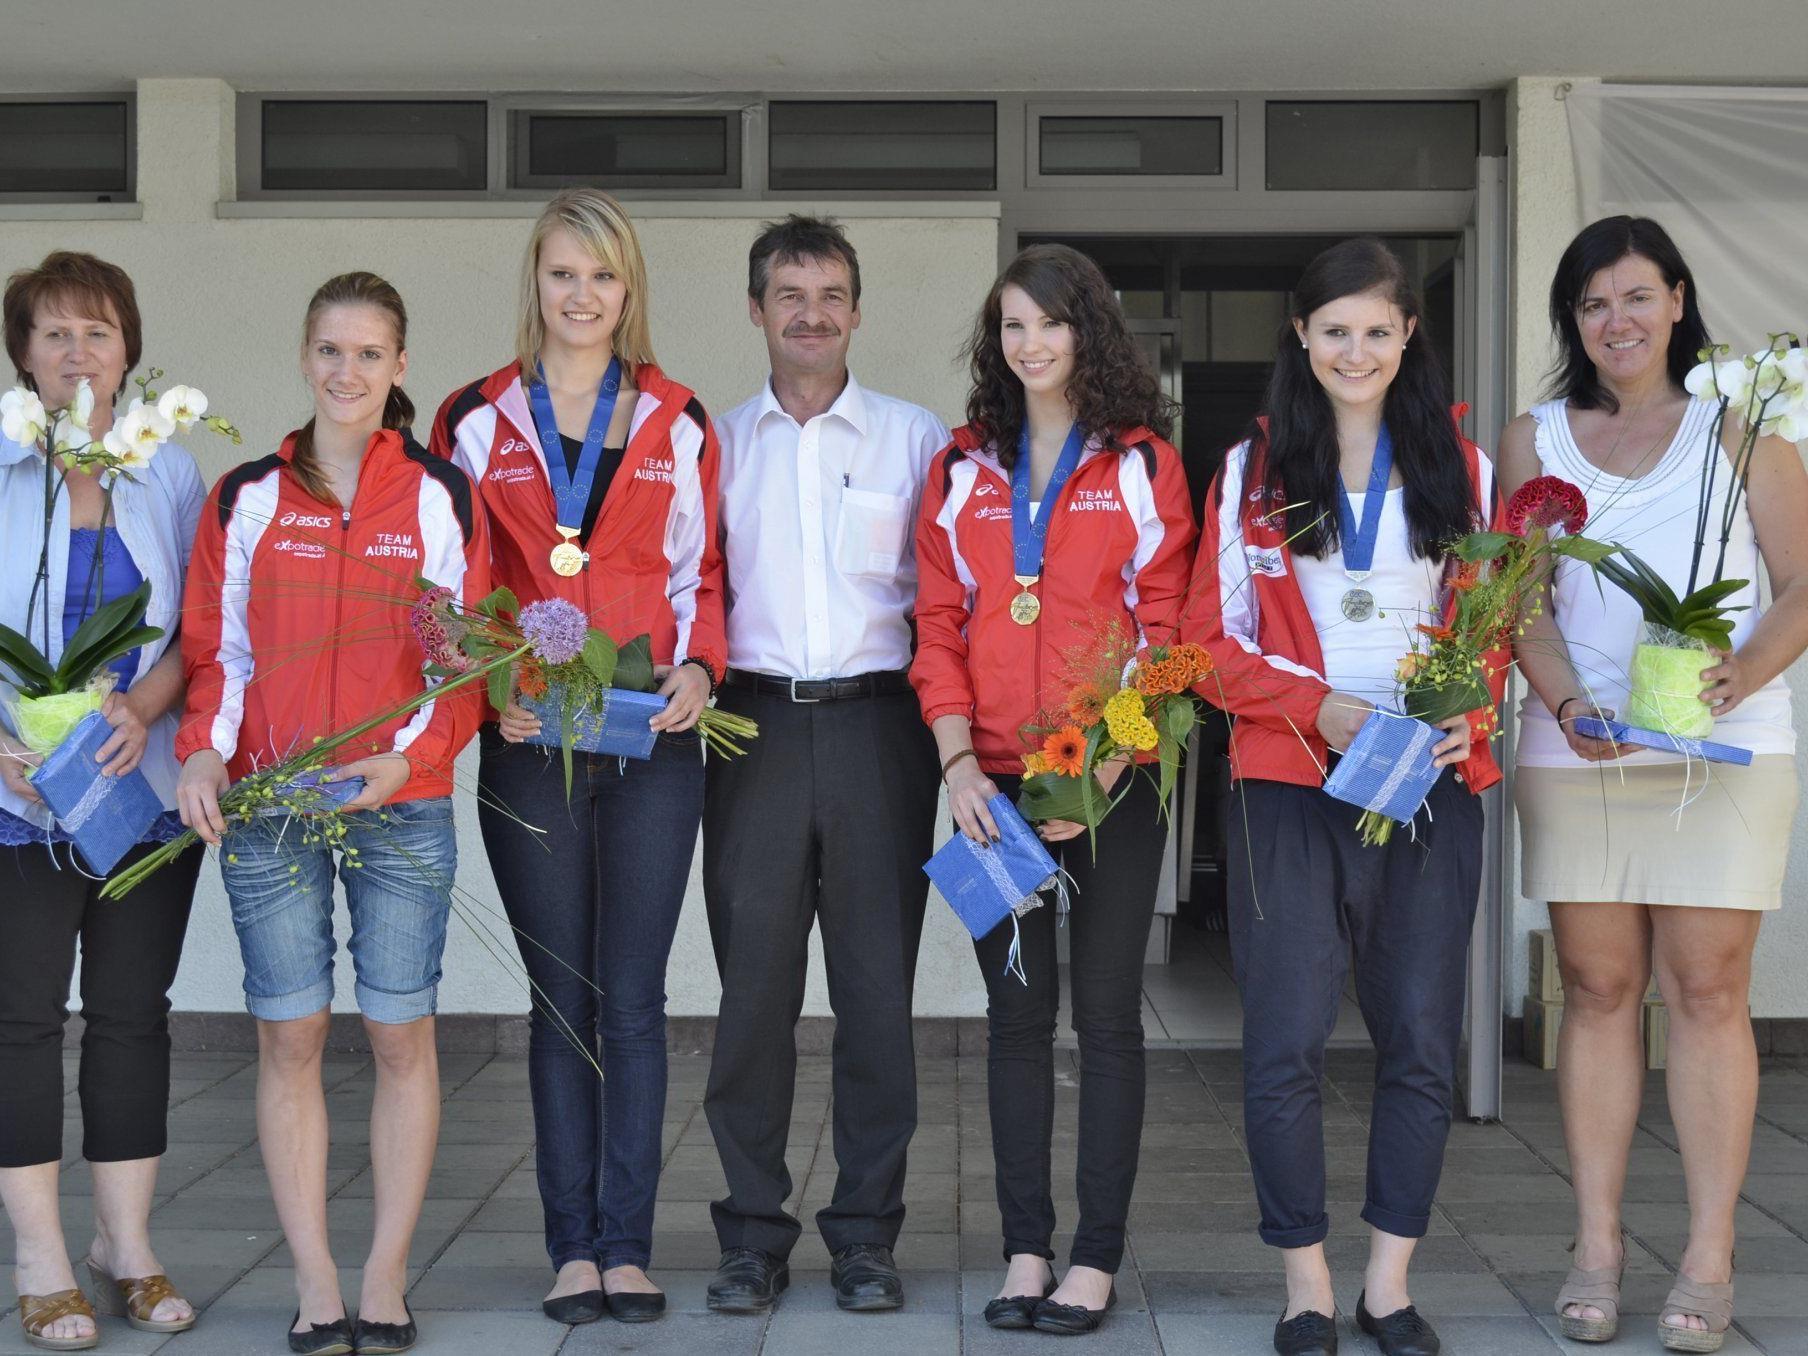 Dagmar Mörth, Carmen Müller (Ersatz), Nadine Mörth (Bronze), Obmann Gerold Kühne, Katharina Kühne (Bronze), Adriana Mathis (Silber), Sabine Mathis.